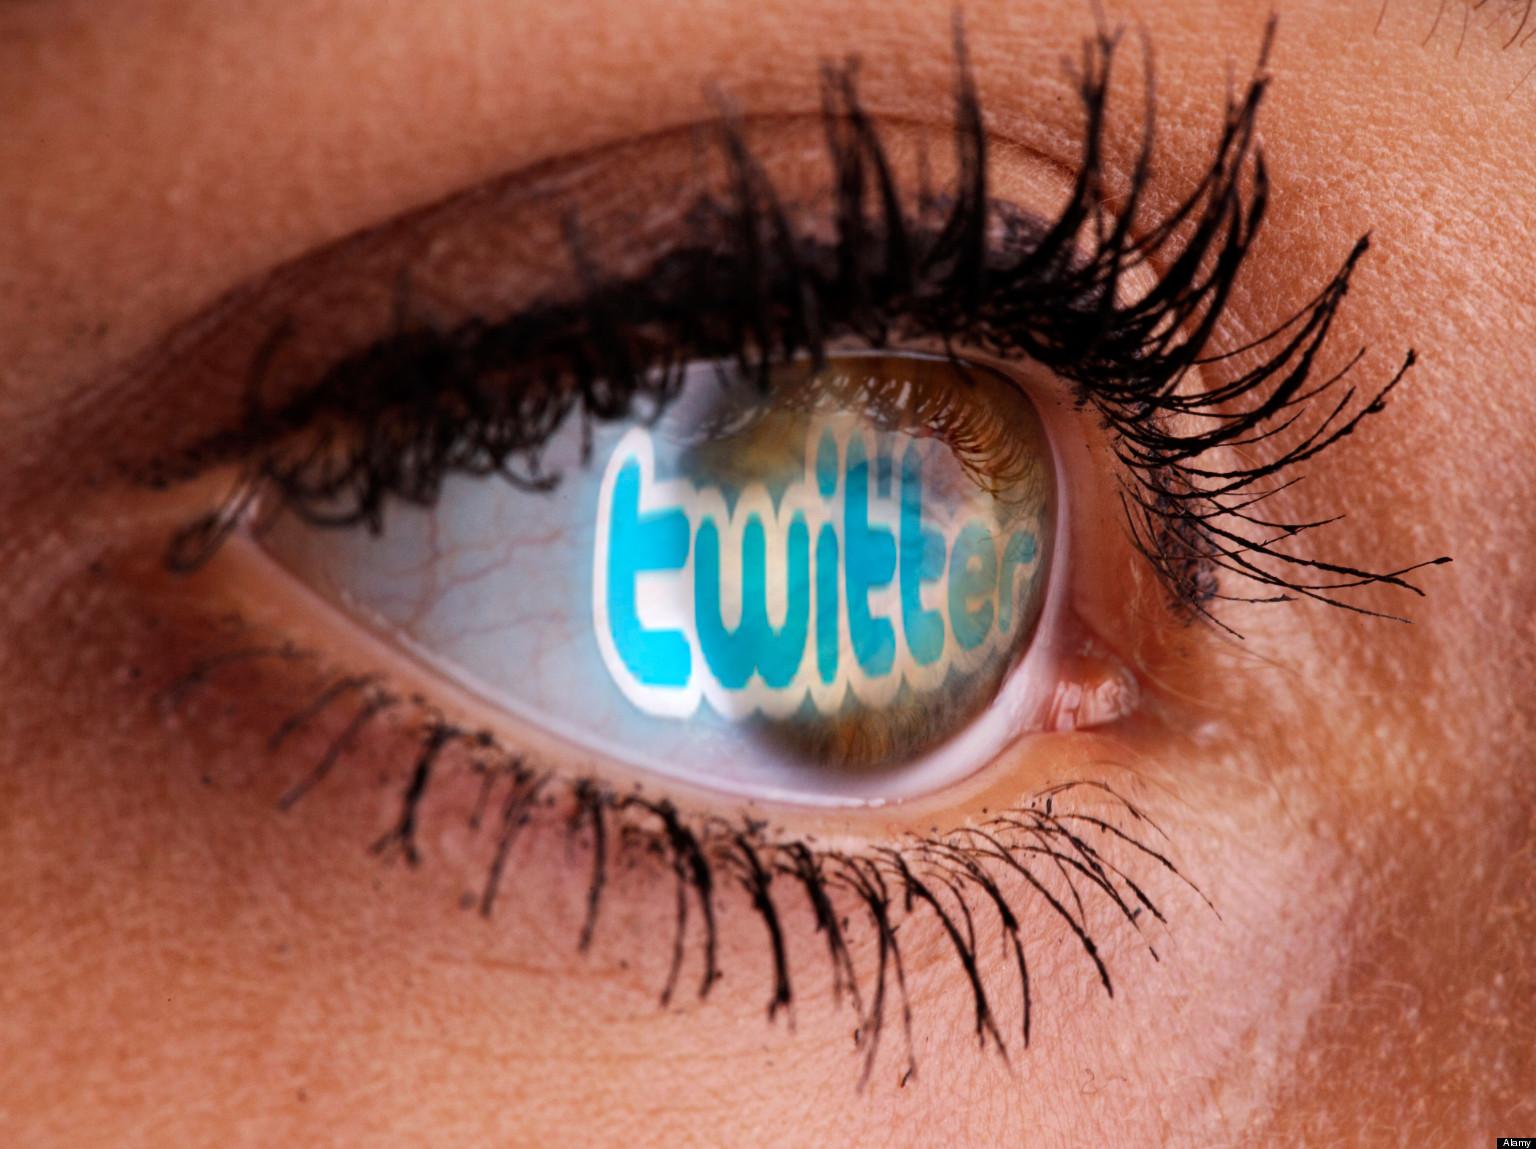 Carly McKinney: High school teacher, 23, tweeted nude